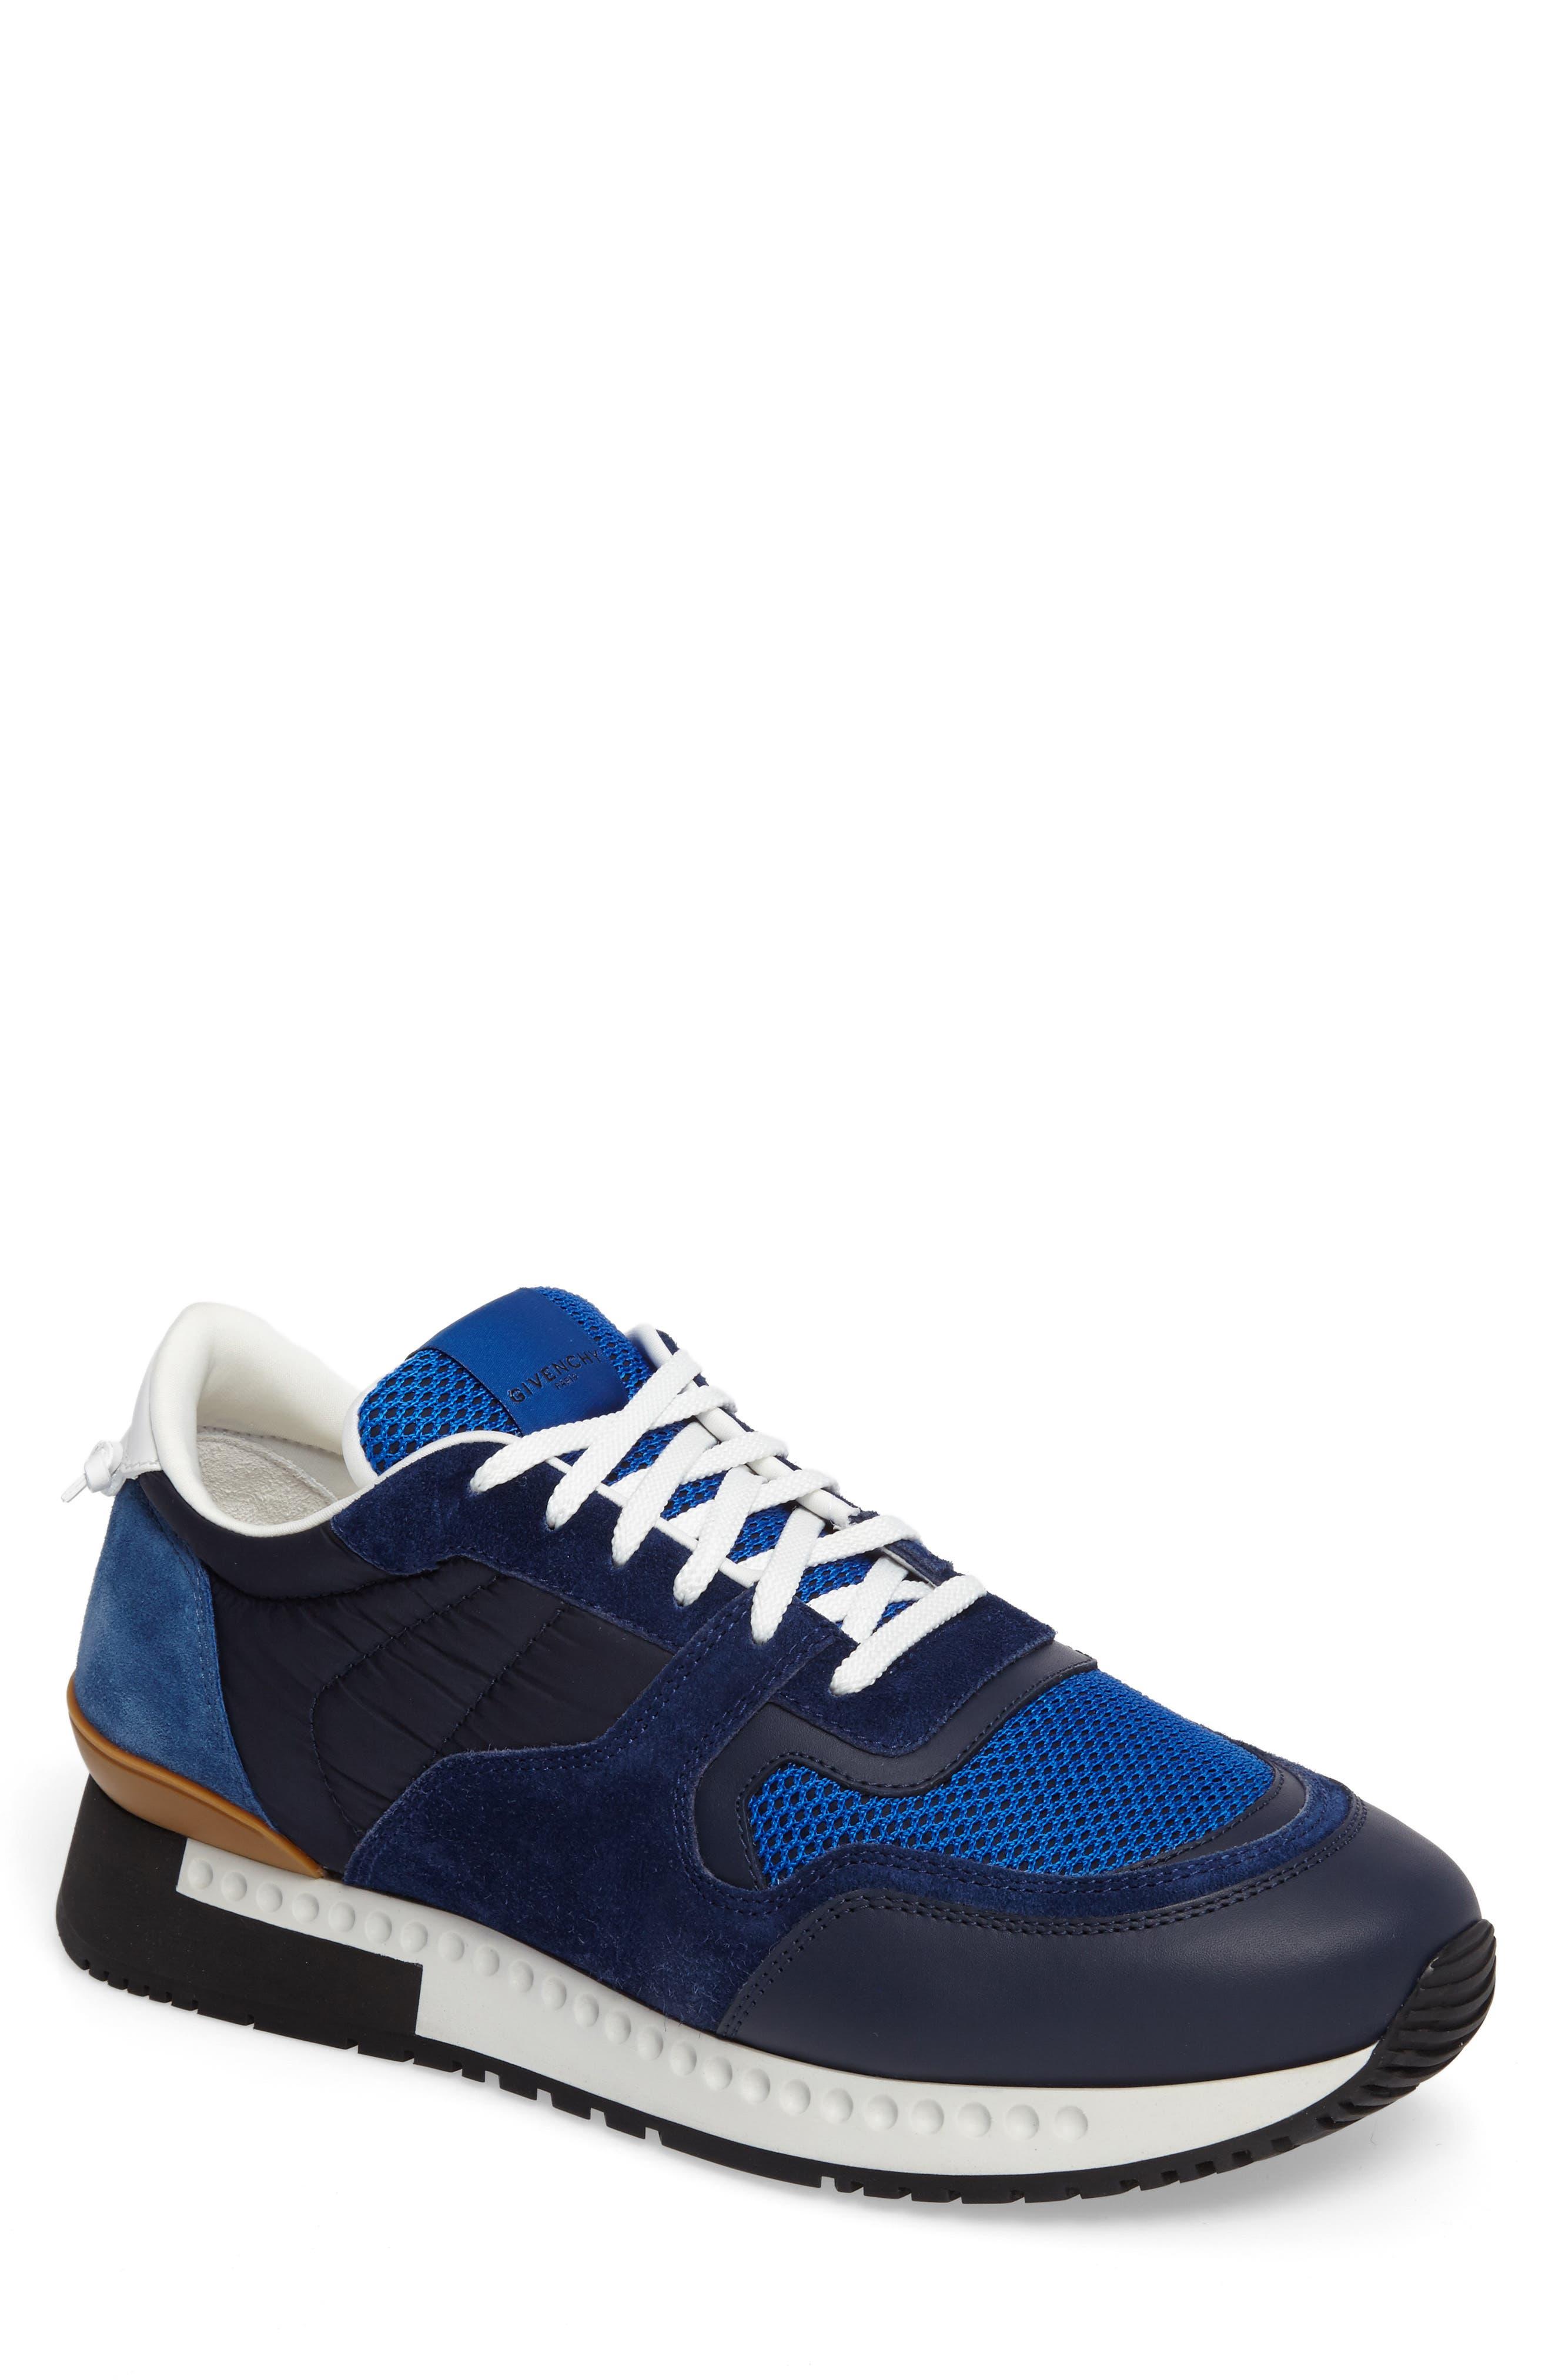 Main Image - Givenchy Mixed-Finish Sneaker (Men)